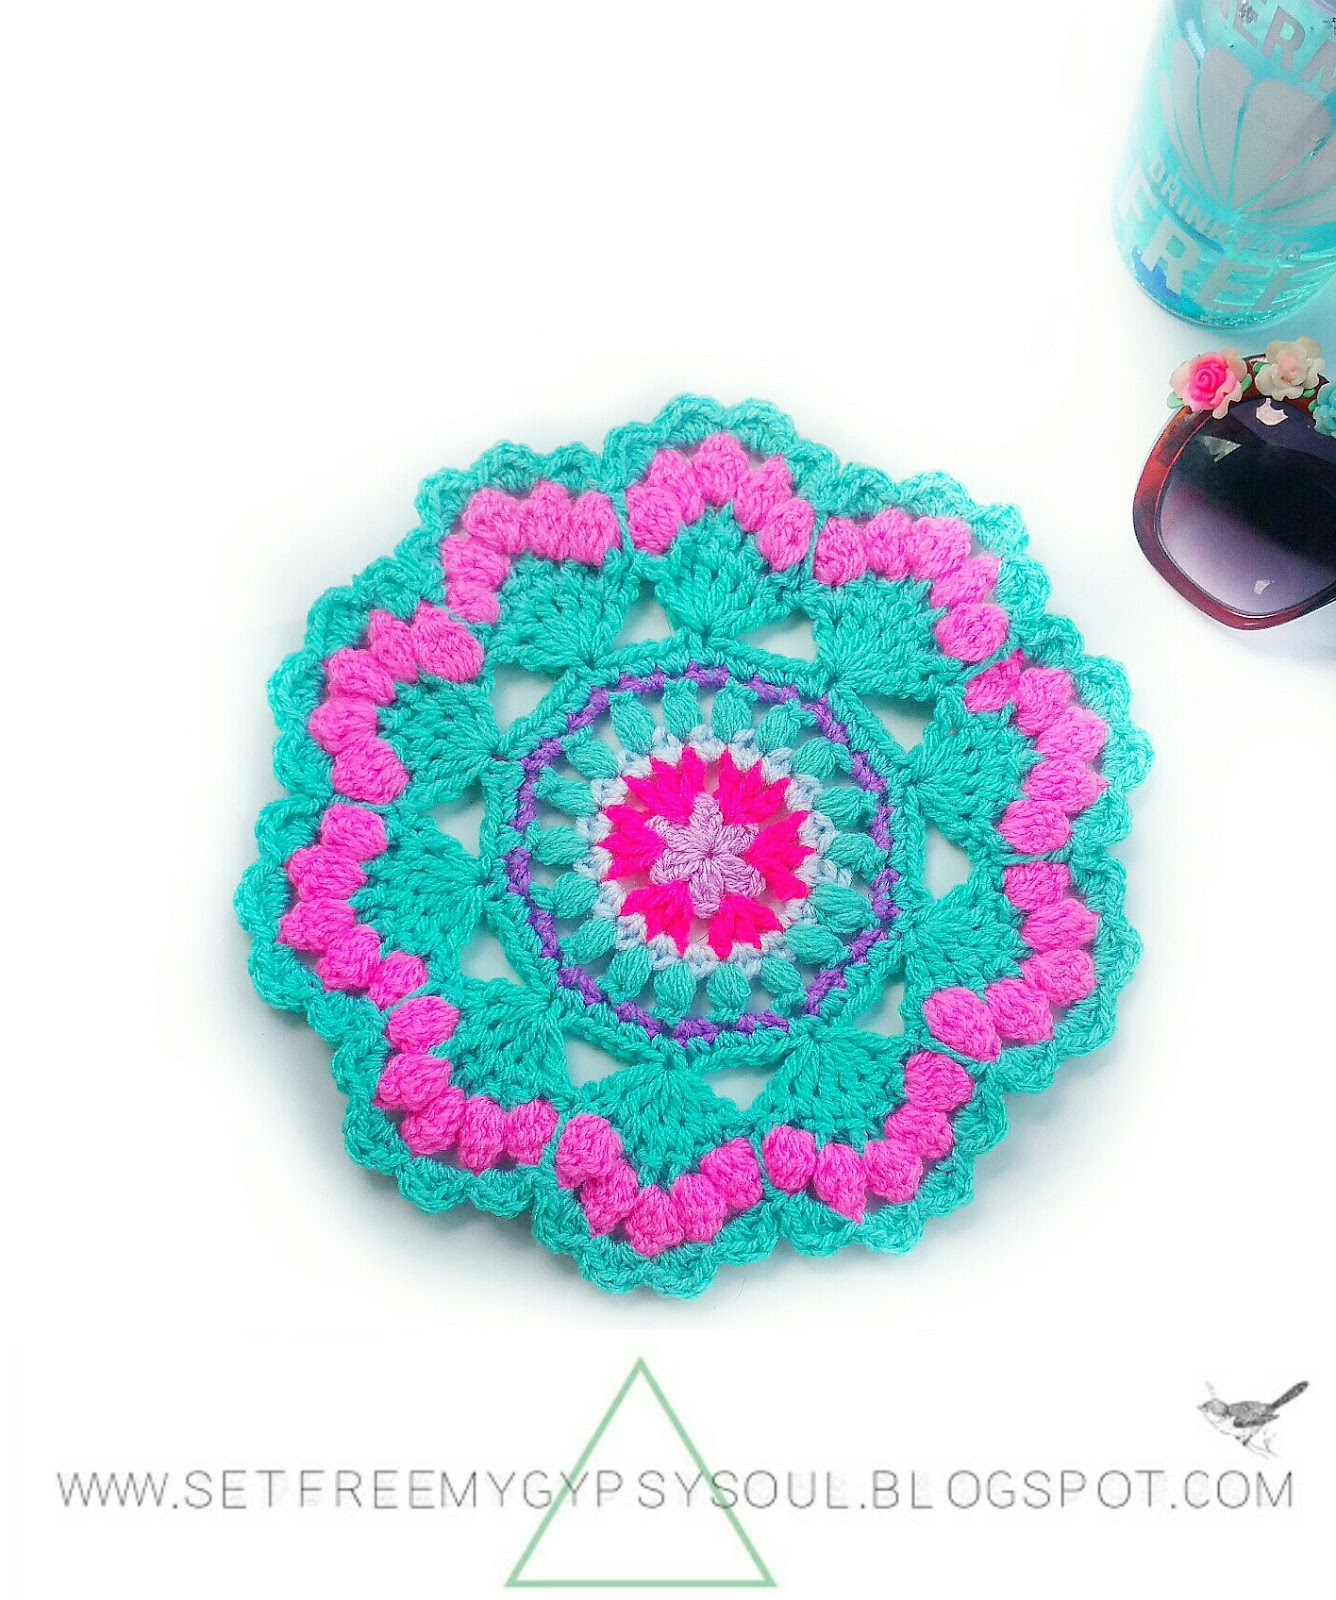 Set Free My Gypsy Soul A Crochet Craft Blog July 2016